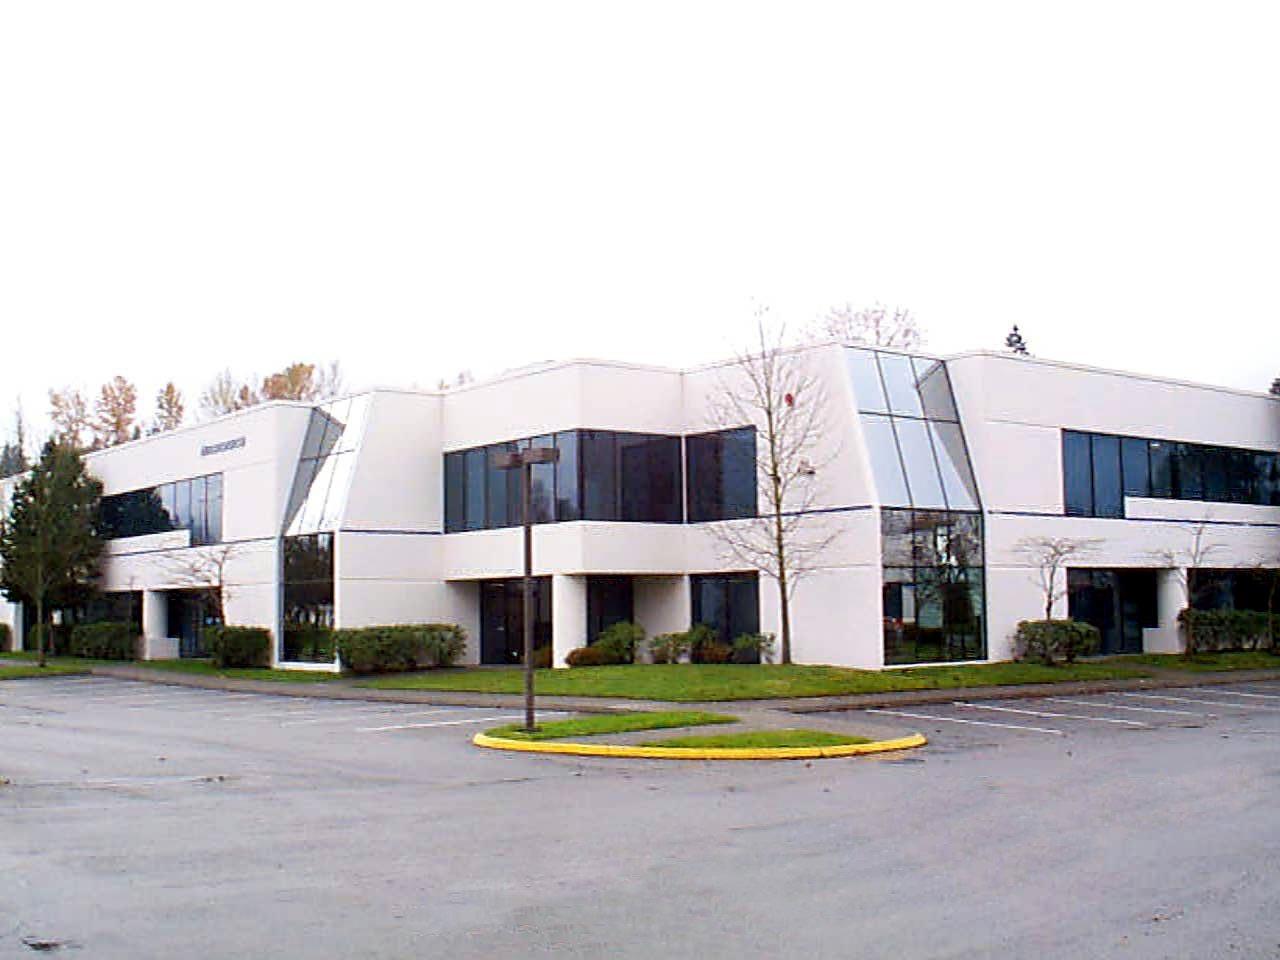 8461 154th Ave NE #200 Property Photo - Redmond, WA real estate listing